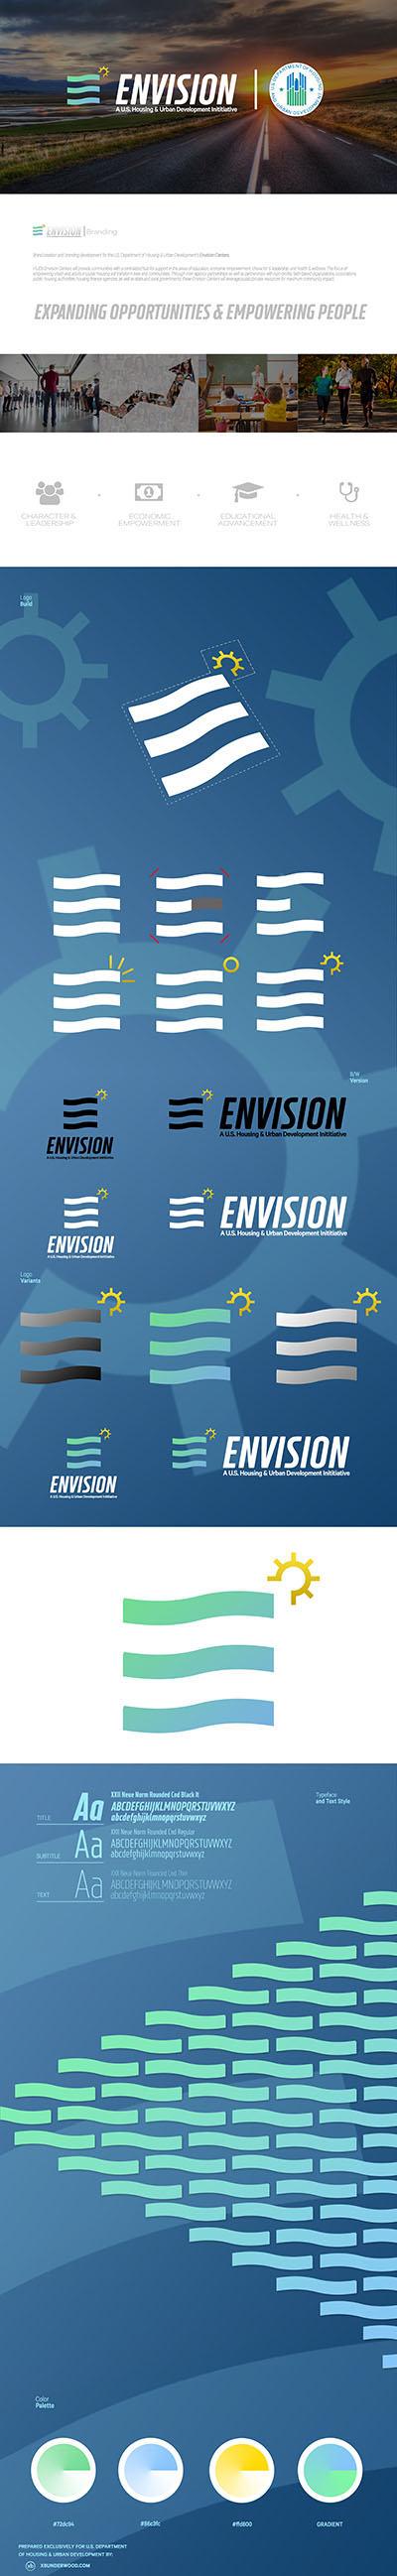 [envision] BRAND GUIDE | Visual Identity.jpg